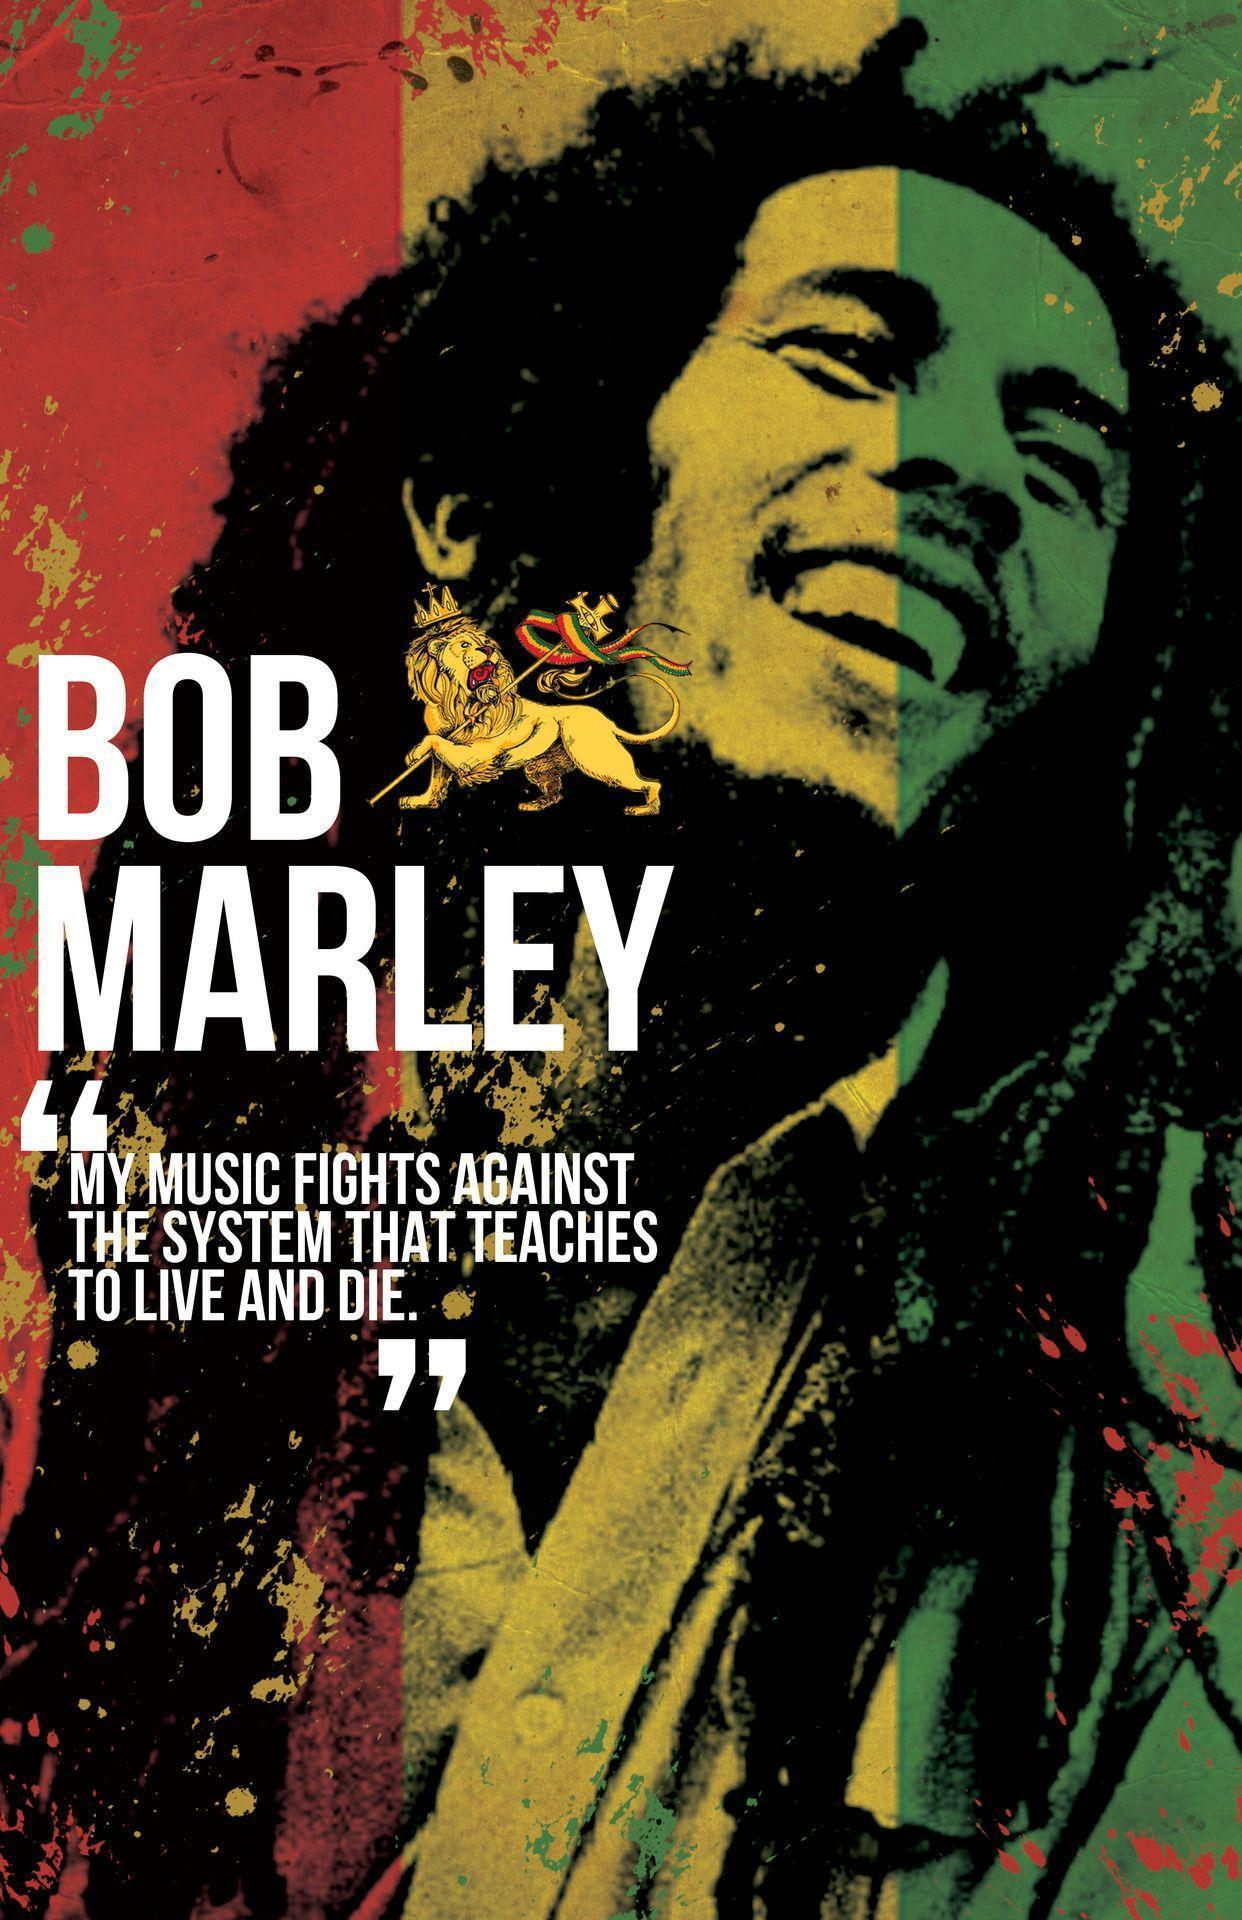 HD Bob Marley 4k Picture for Desktop